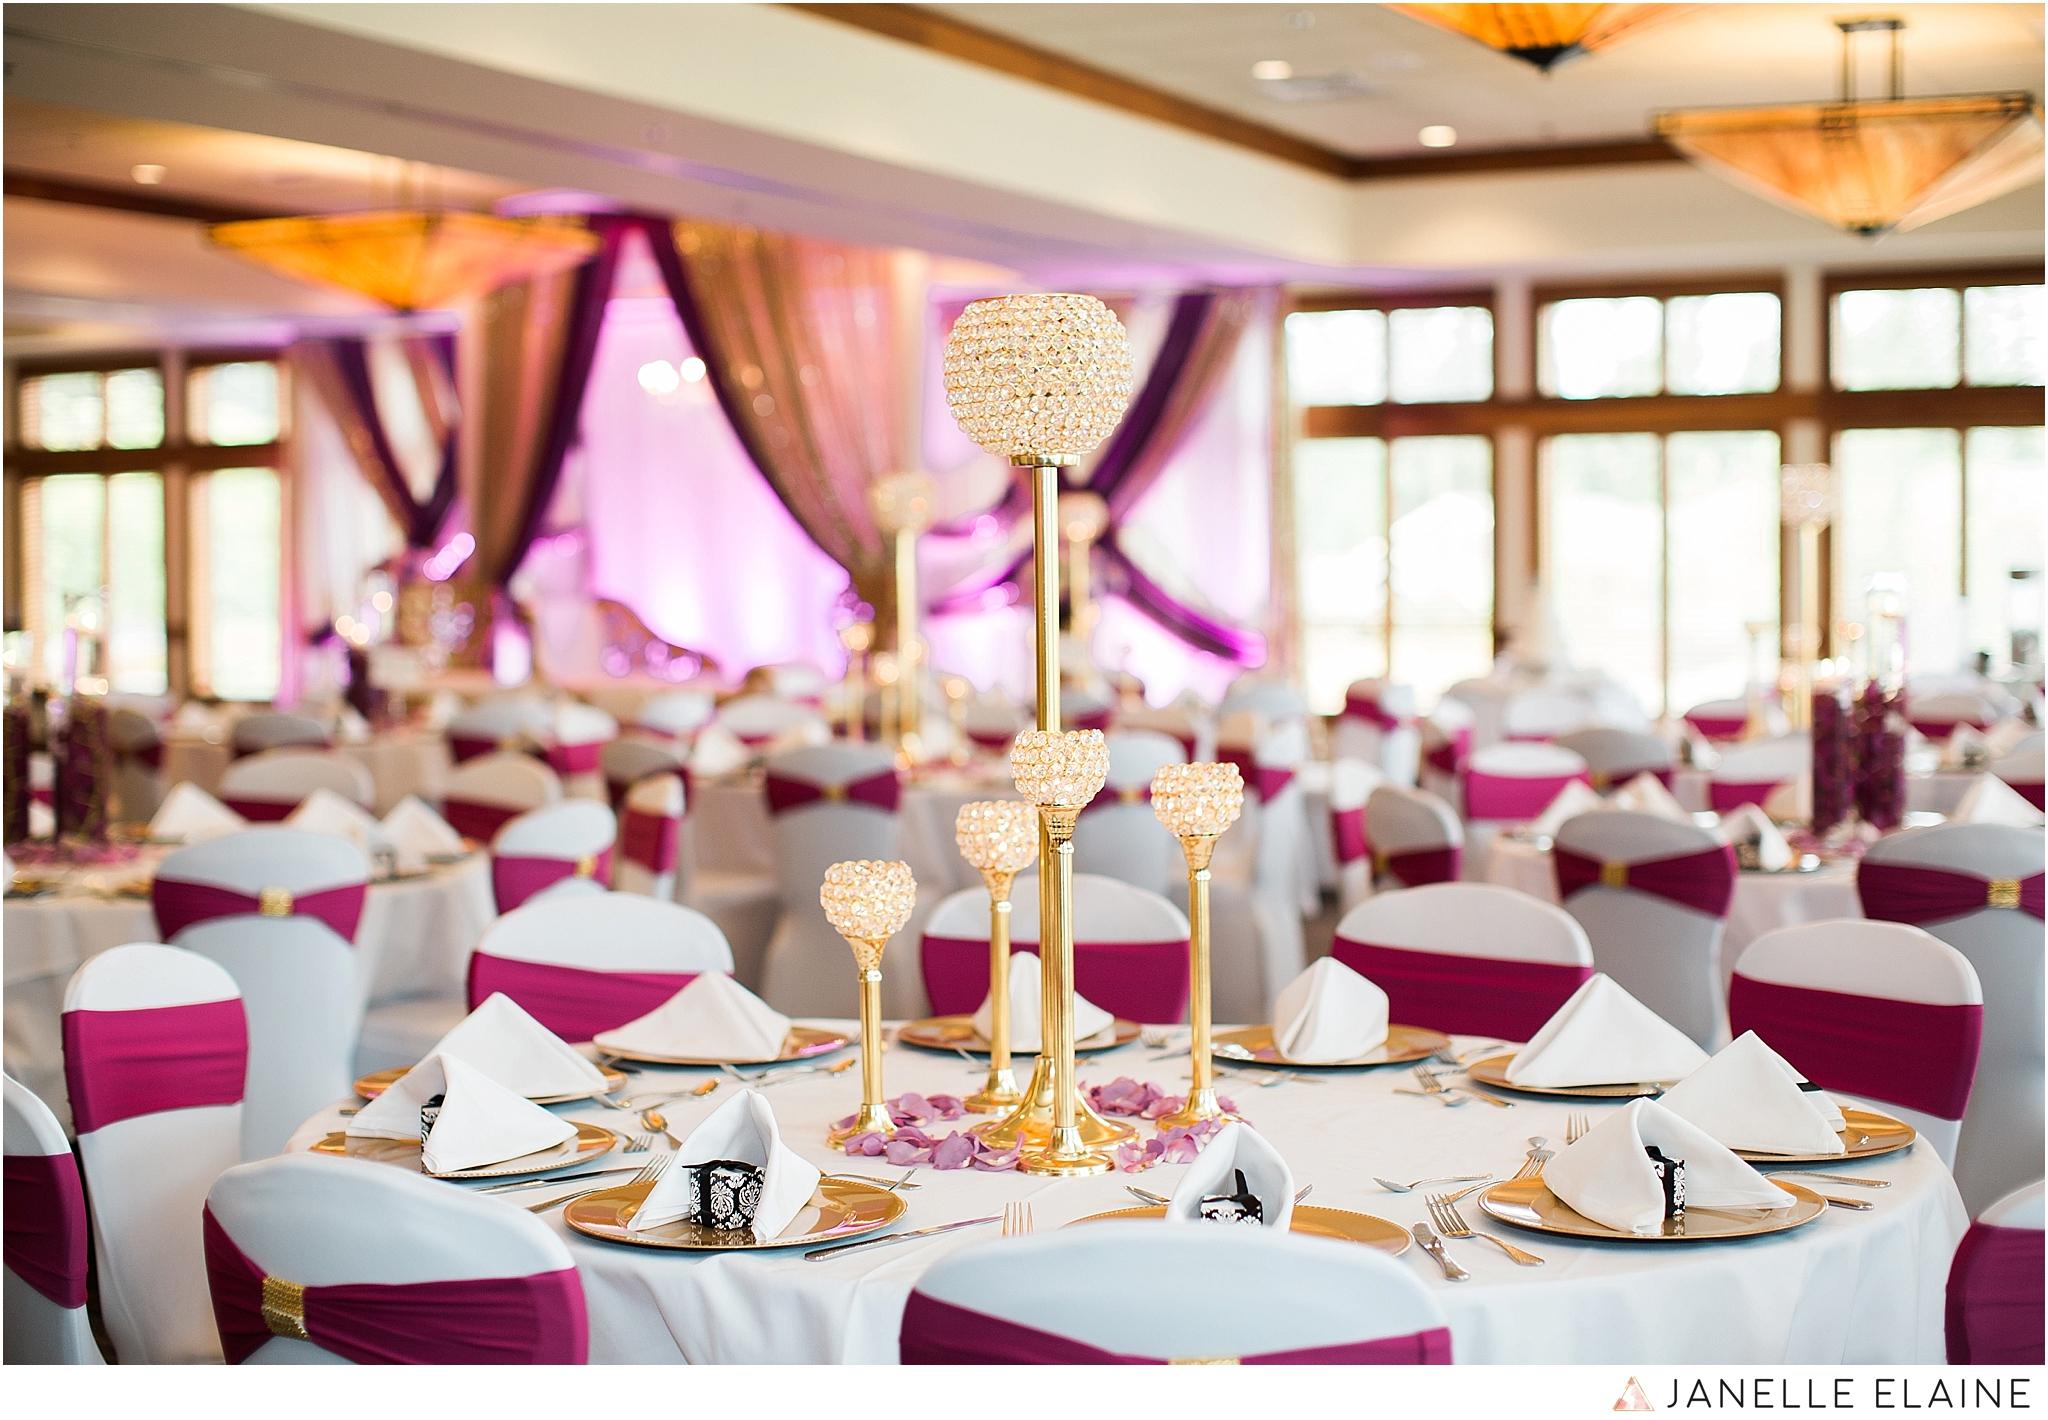 janelle elaine photography-the club at snoqualmie ridge-washington-wedding-photography-reception-16.jpg